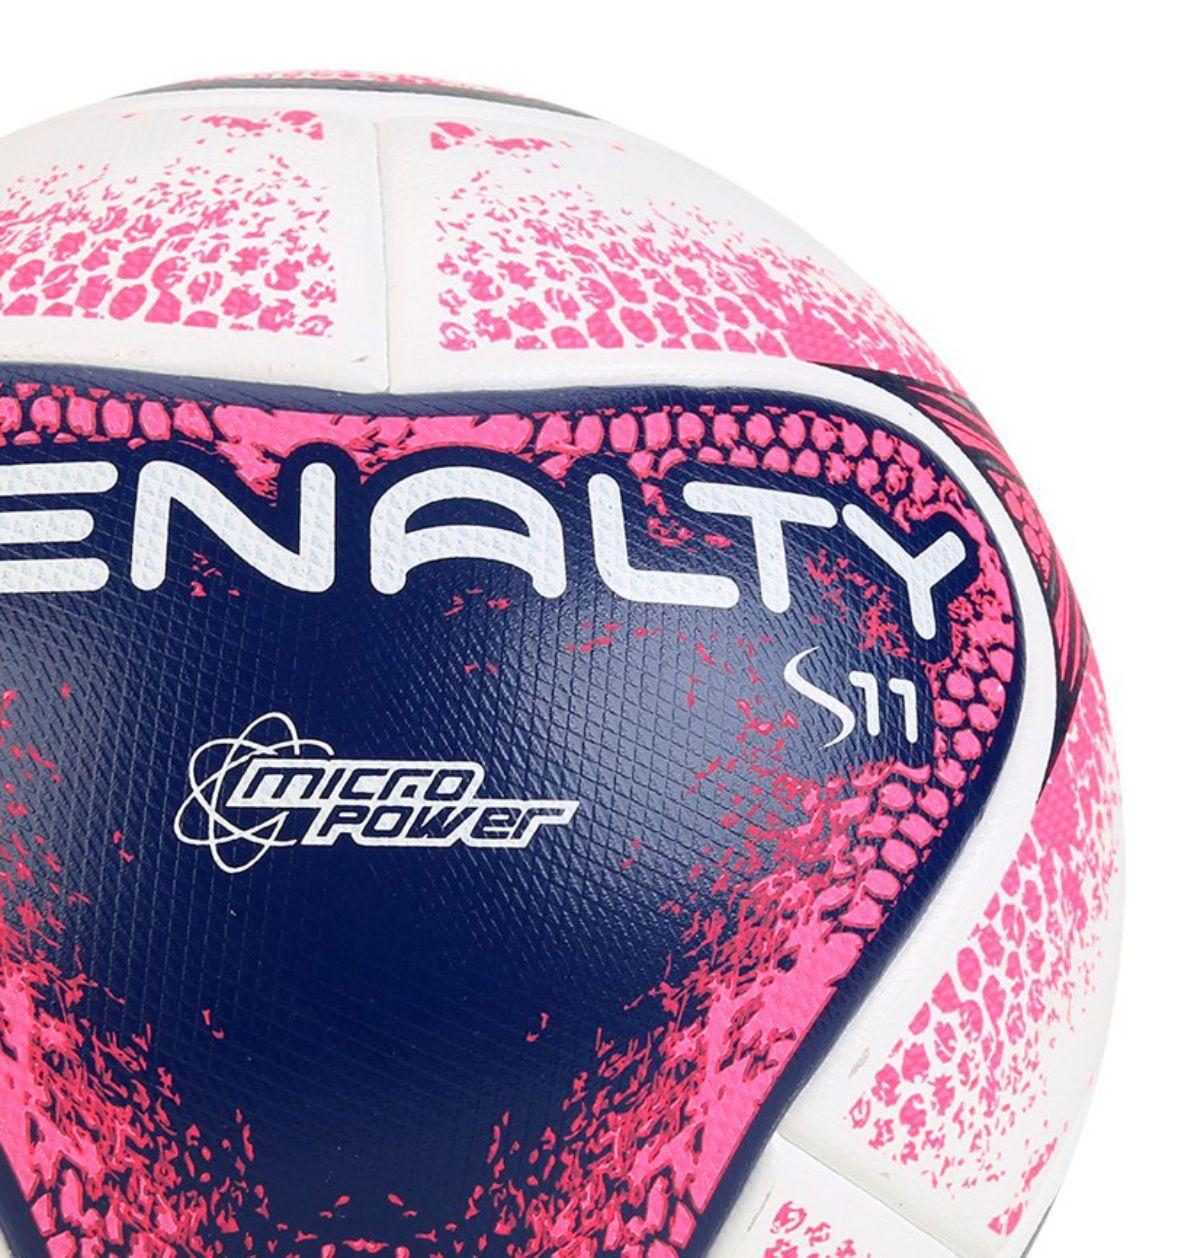 Bola Futebol de Campo Penalty S11 R2 Termotec VIII